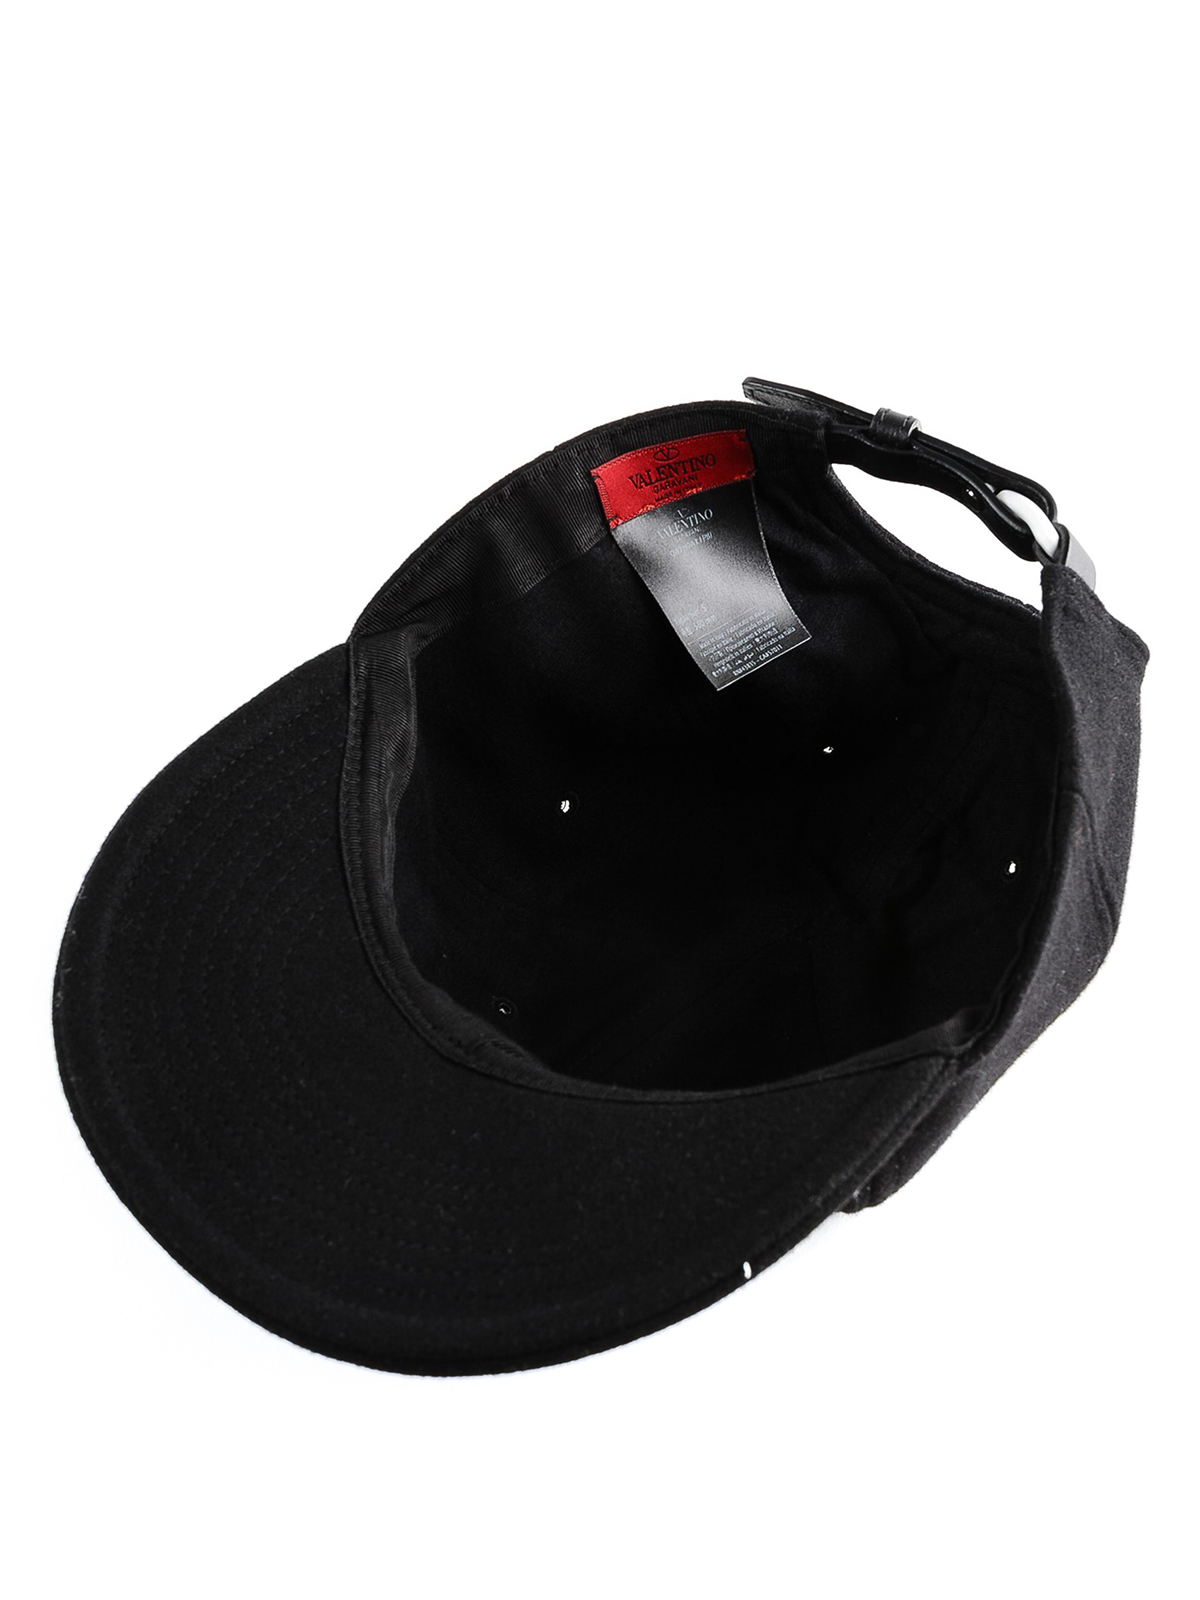 cf70b83c VALENTINO GARAVANI buy online VLTN embroidery baseball cap. VALENTINO  GARAVANI: hats & caps ...